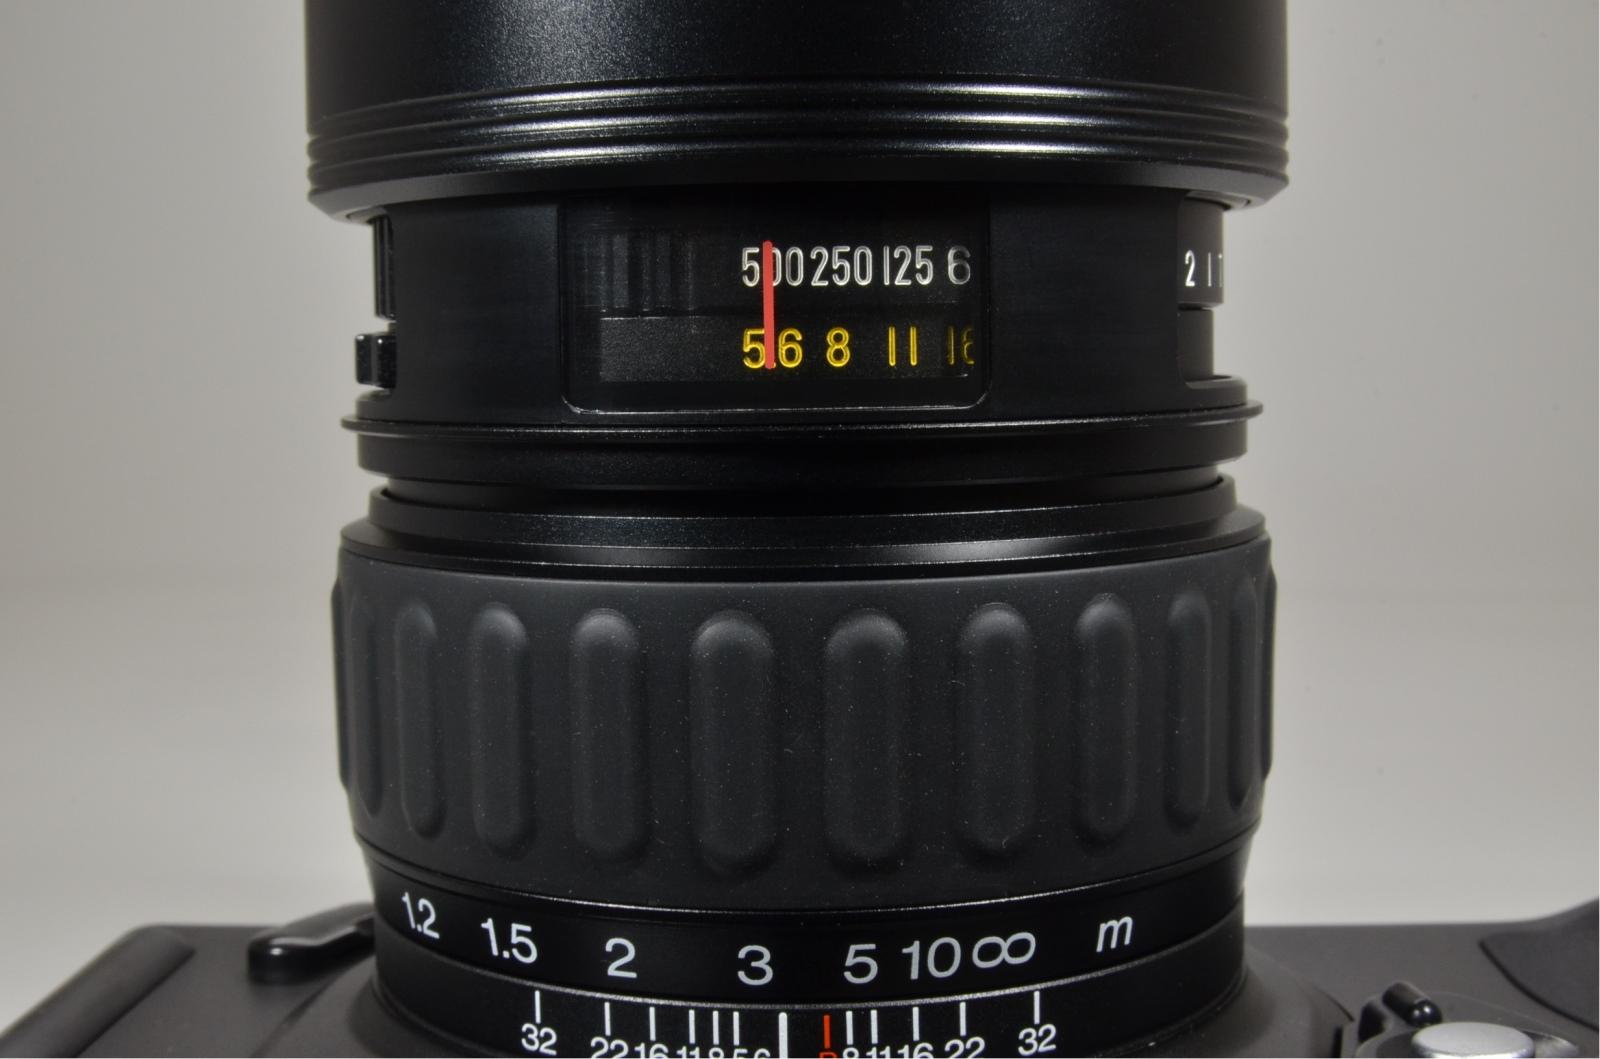 fuji fujifilm gsw690iii 65mm f5.6 medium format count only '064'